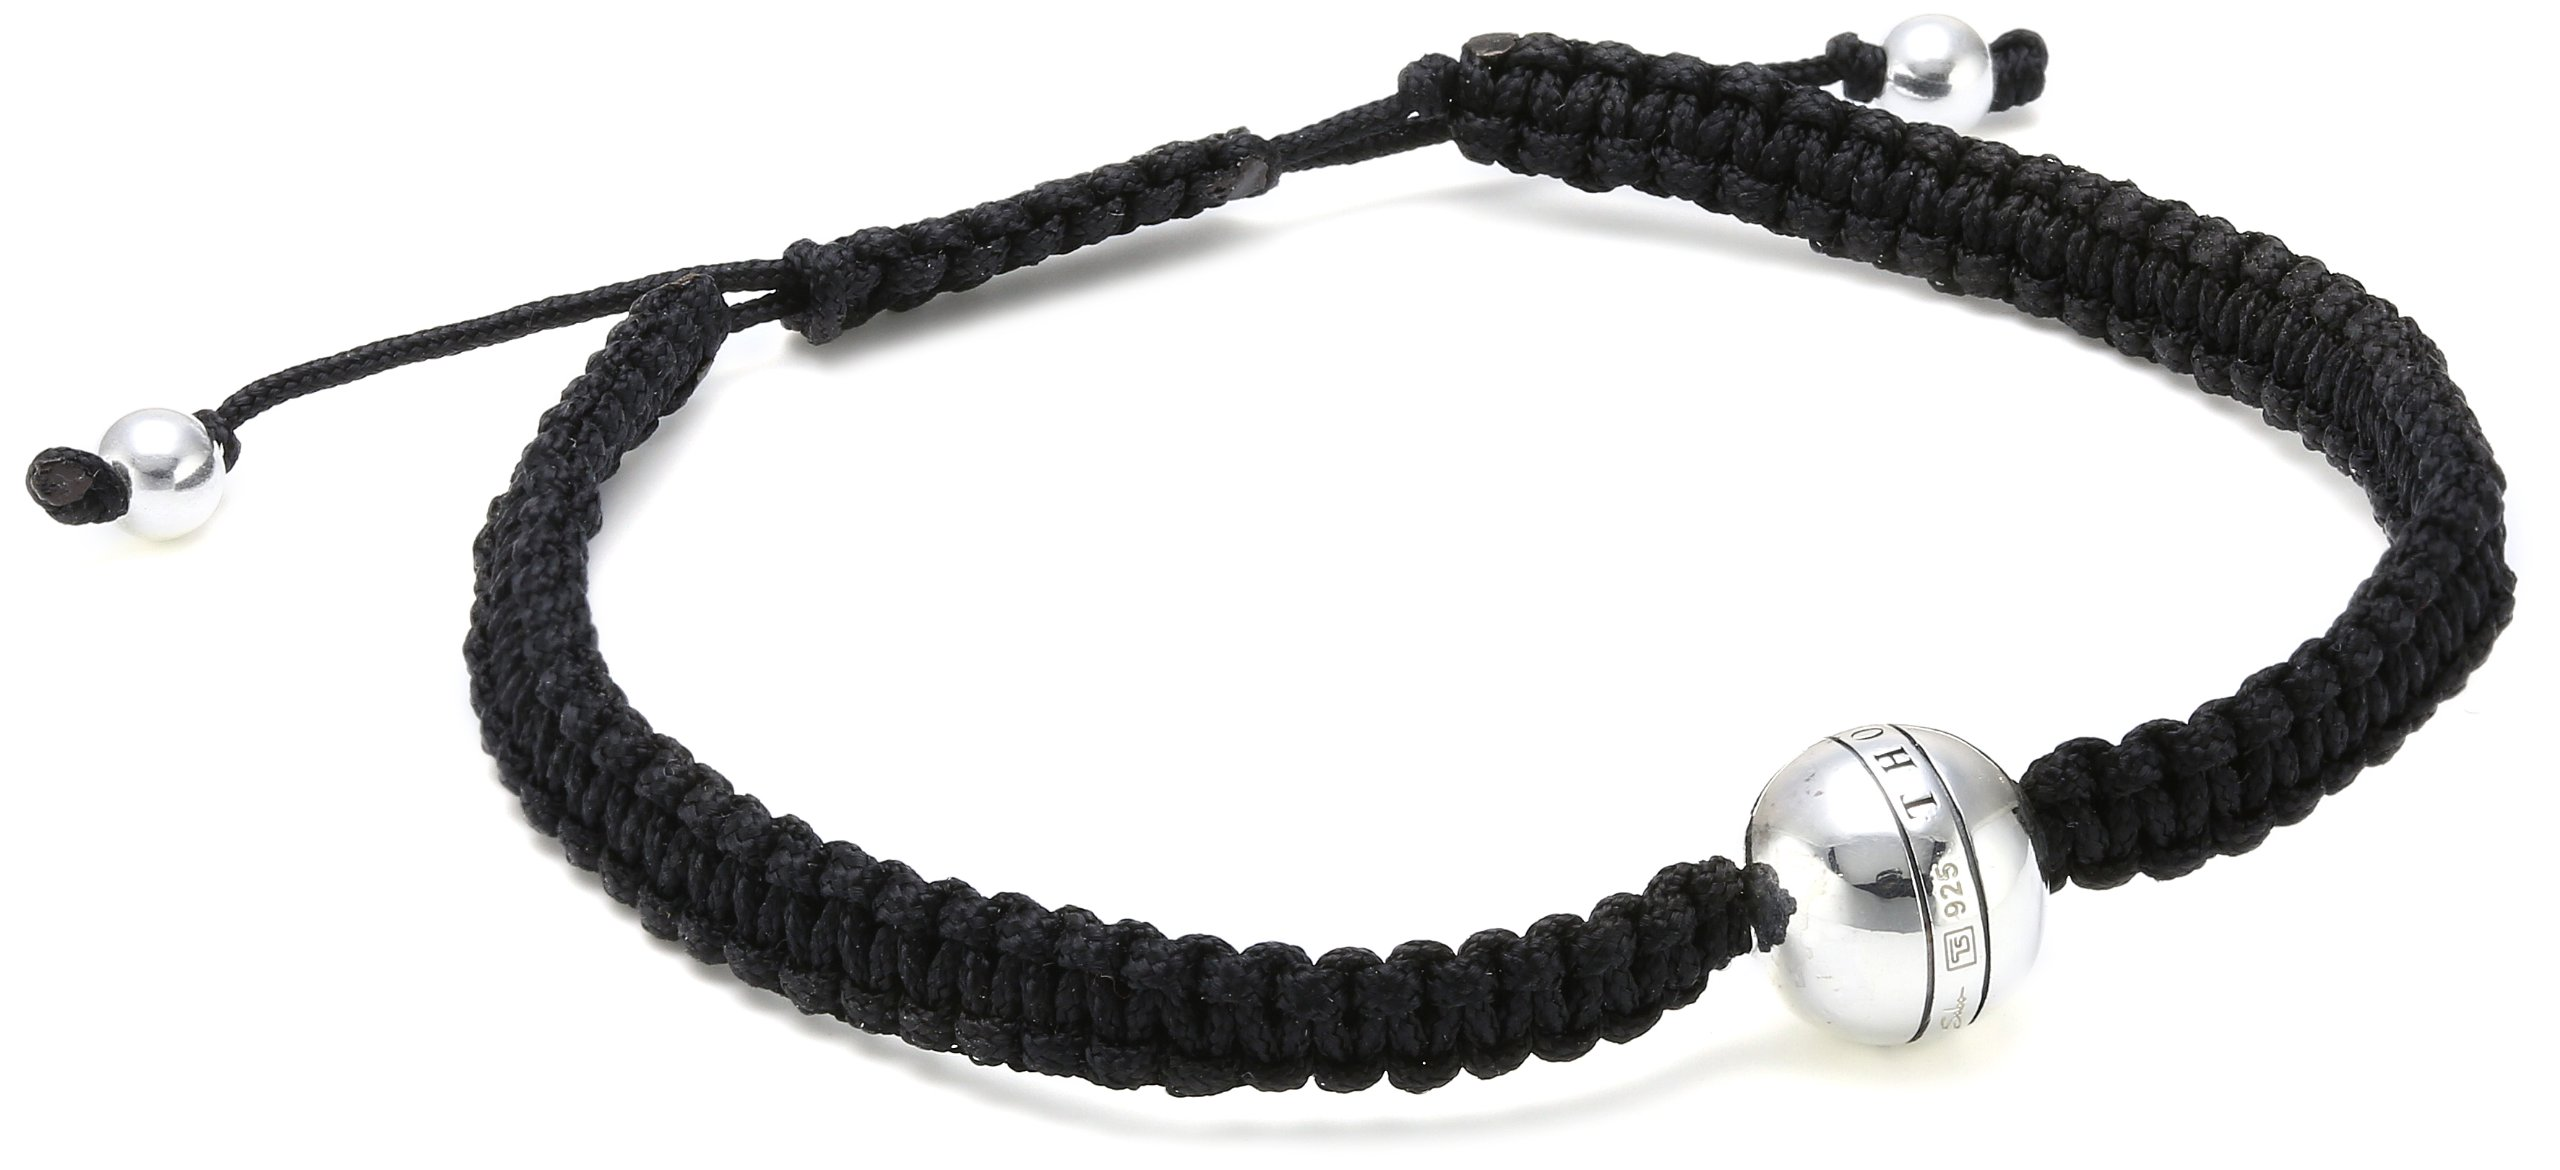 Damen-Armband Sterling Silber Rebel at heart längenverstellbares Stoffarmband Breite 0,6 cm A1119-173-11-L